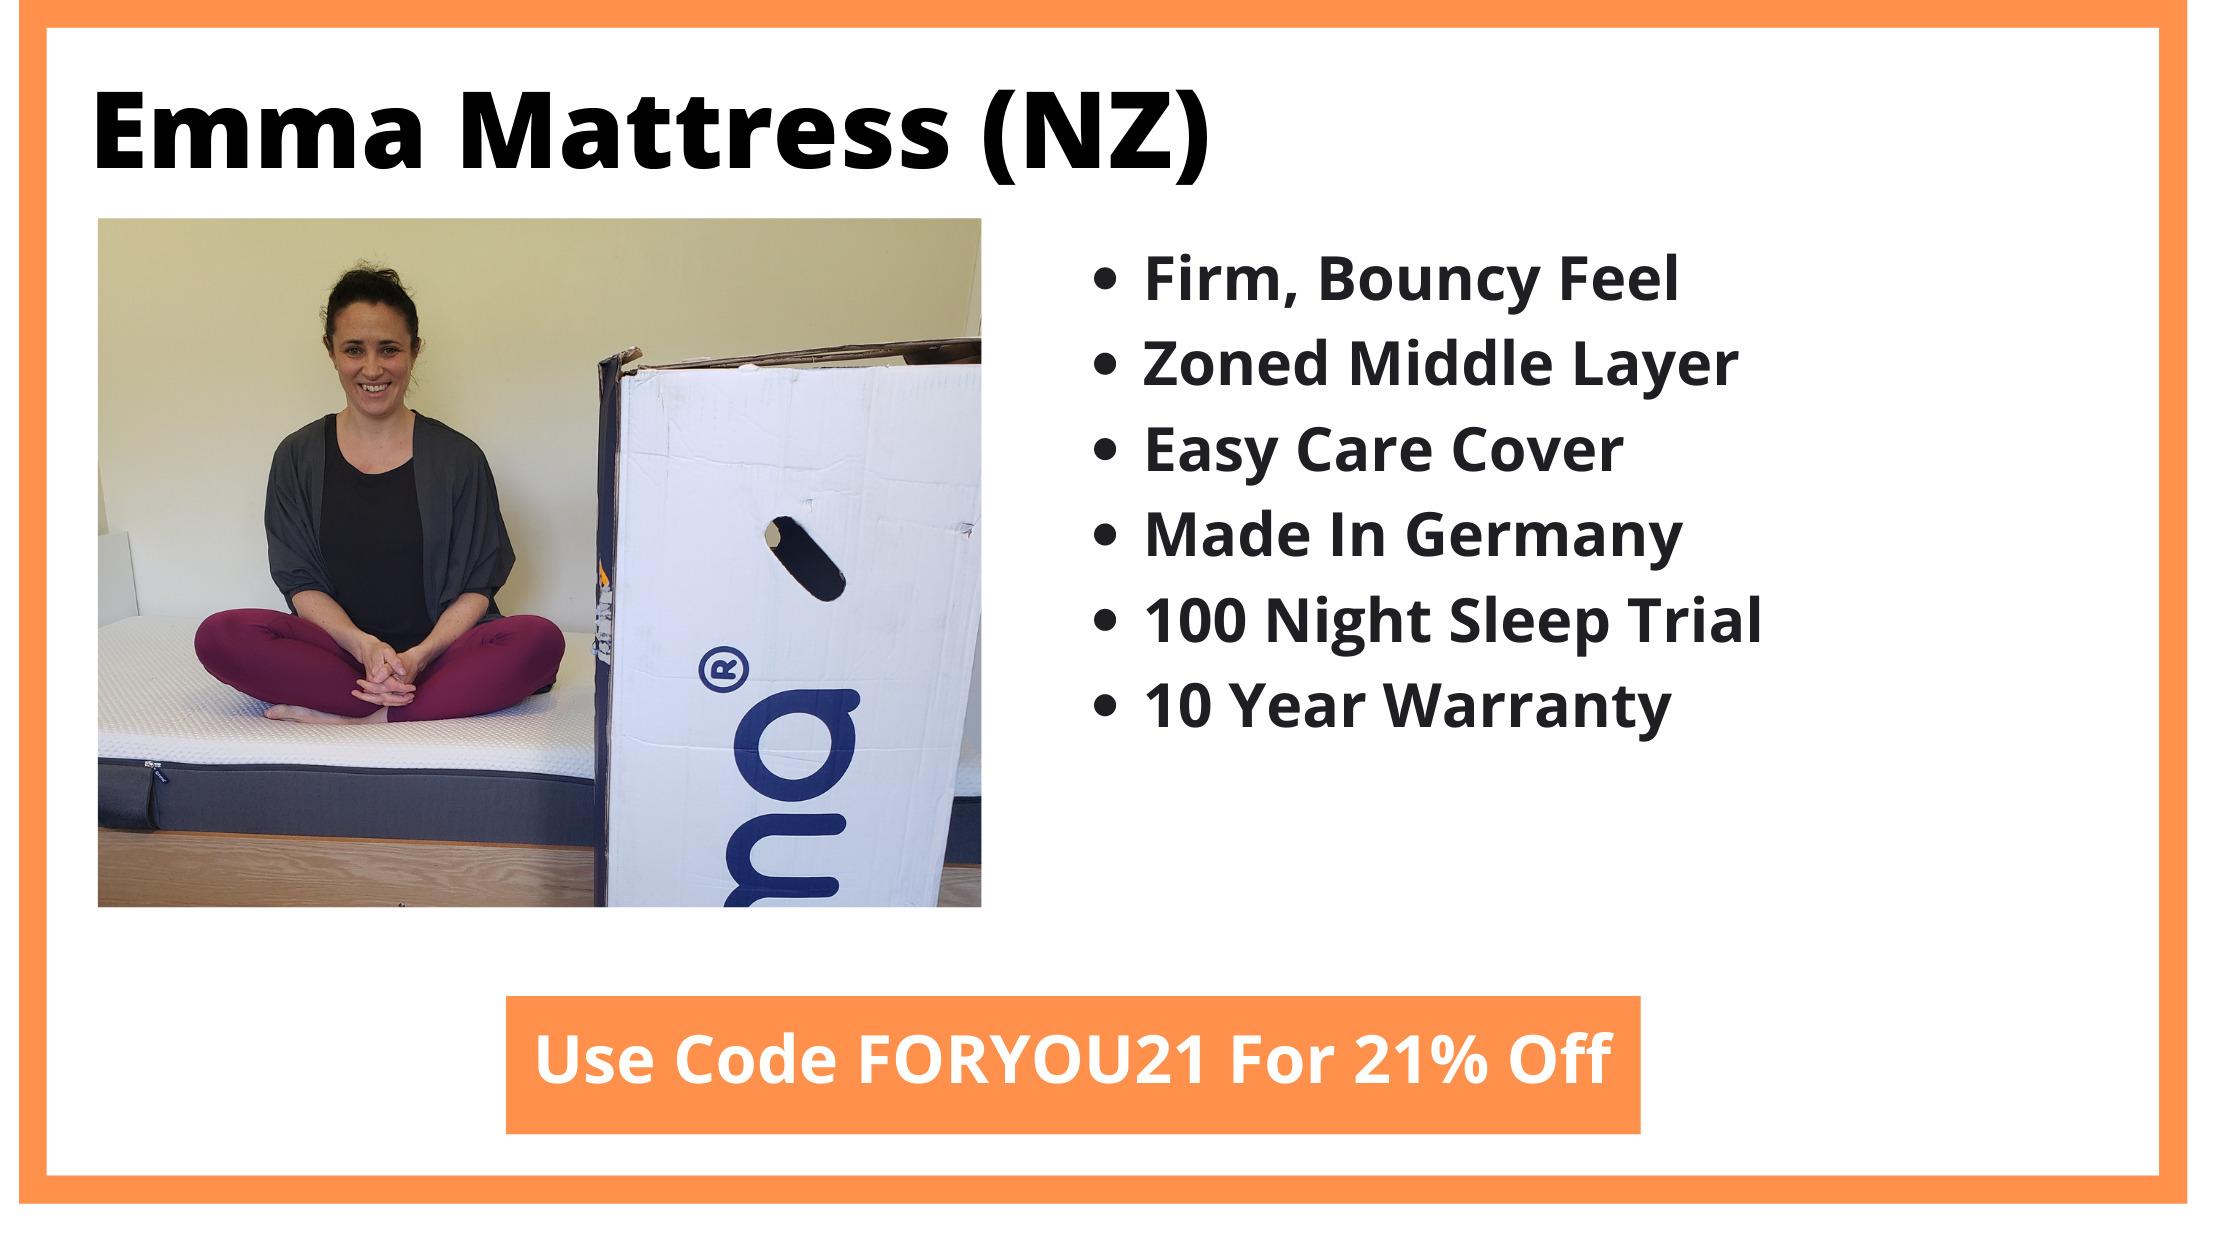 Emma Mattress Review NZ - Cover Image